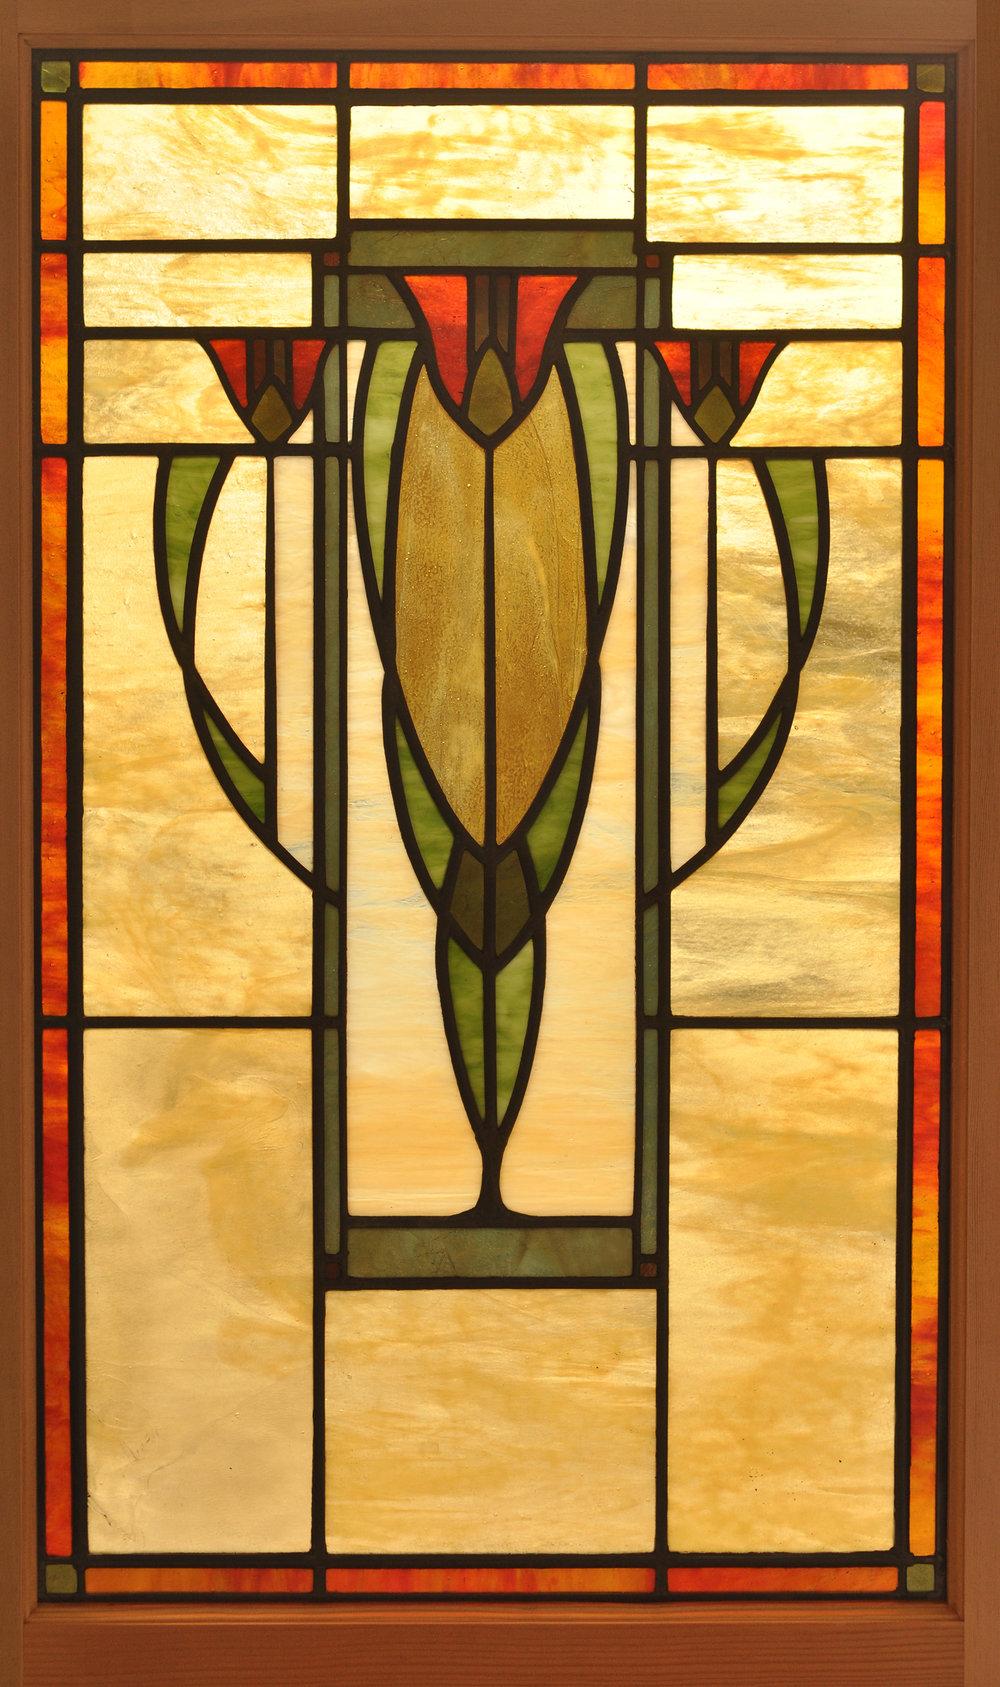 craftsman_tulip.jpg